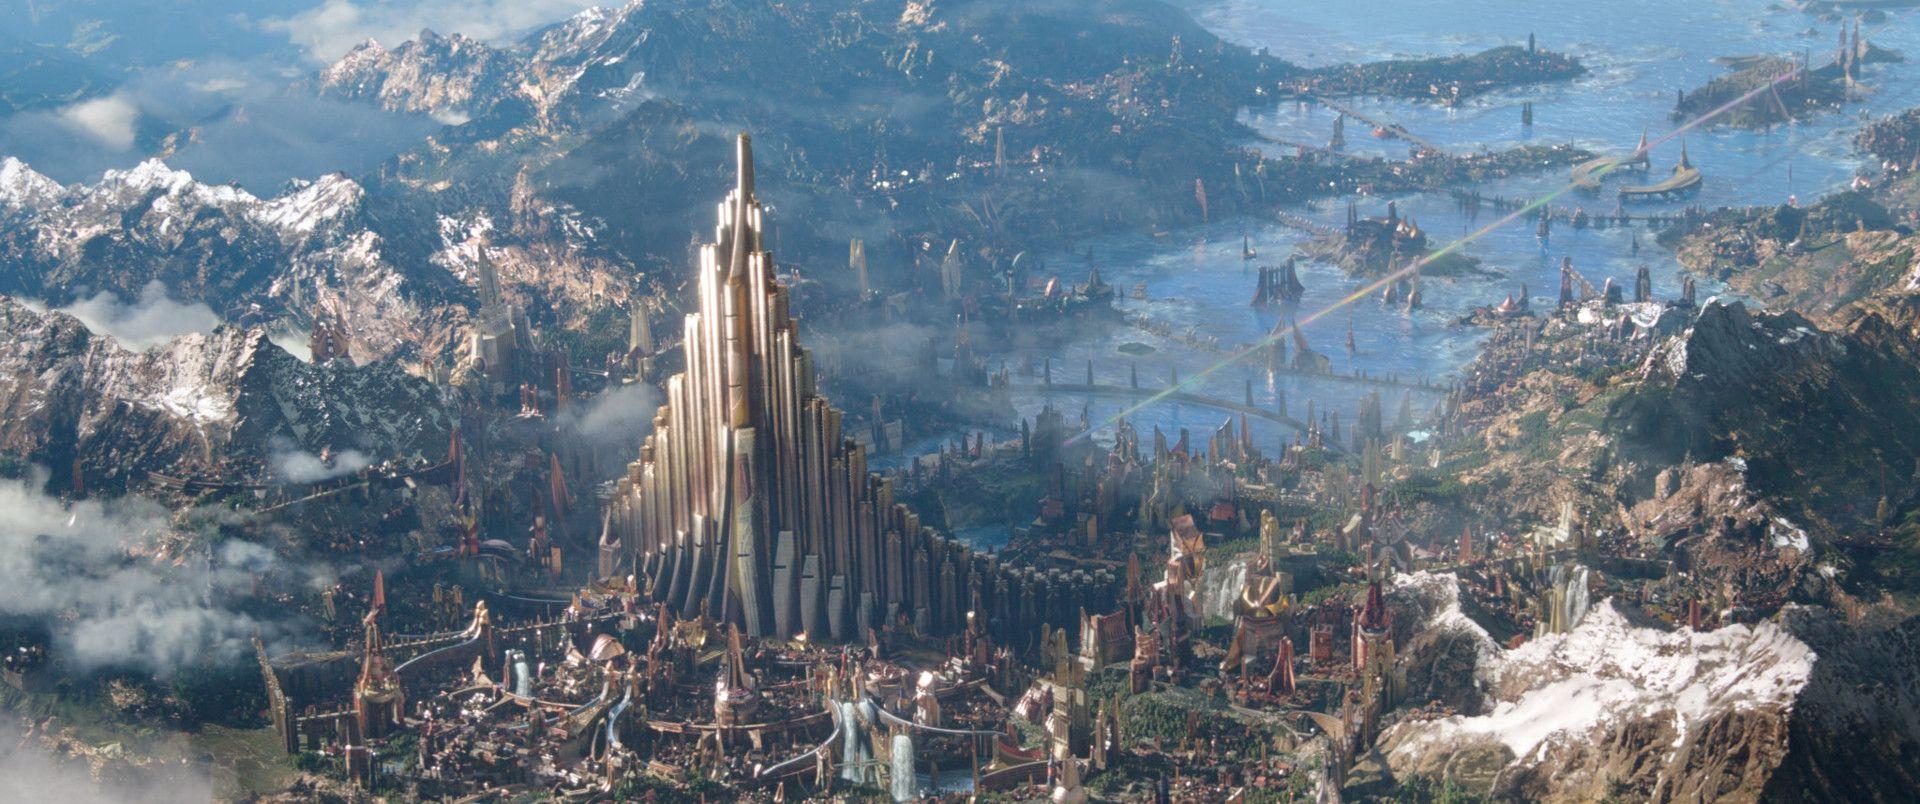 ArtStation - Asgard / thor ragnarok, The Frisbeeman (con immagini)